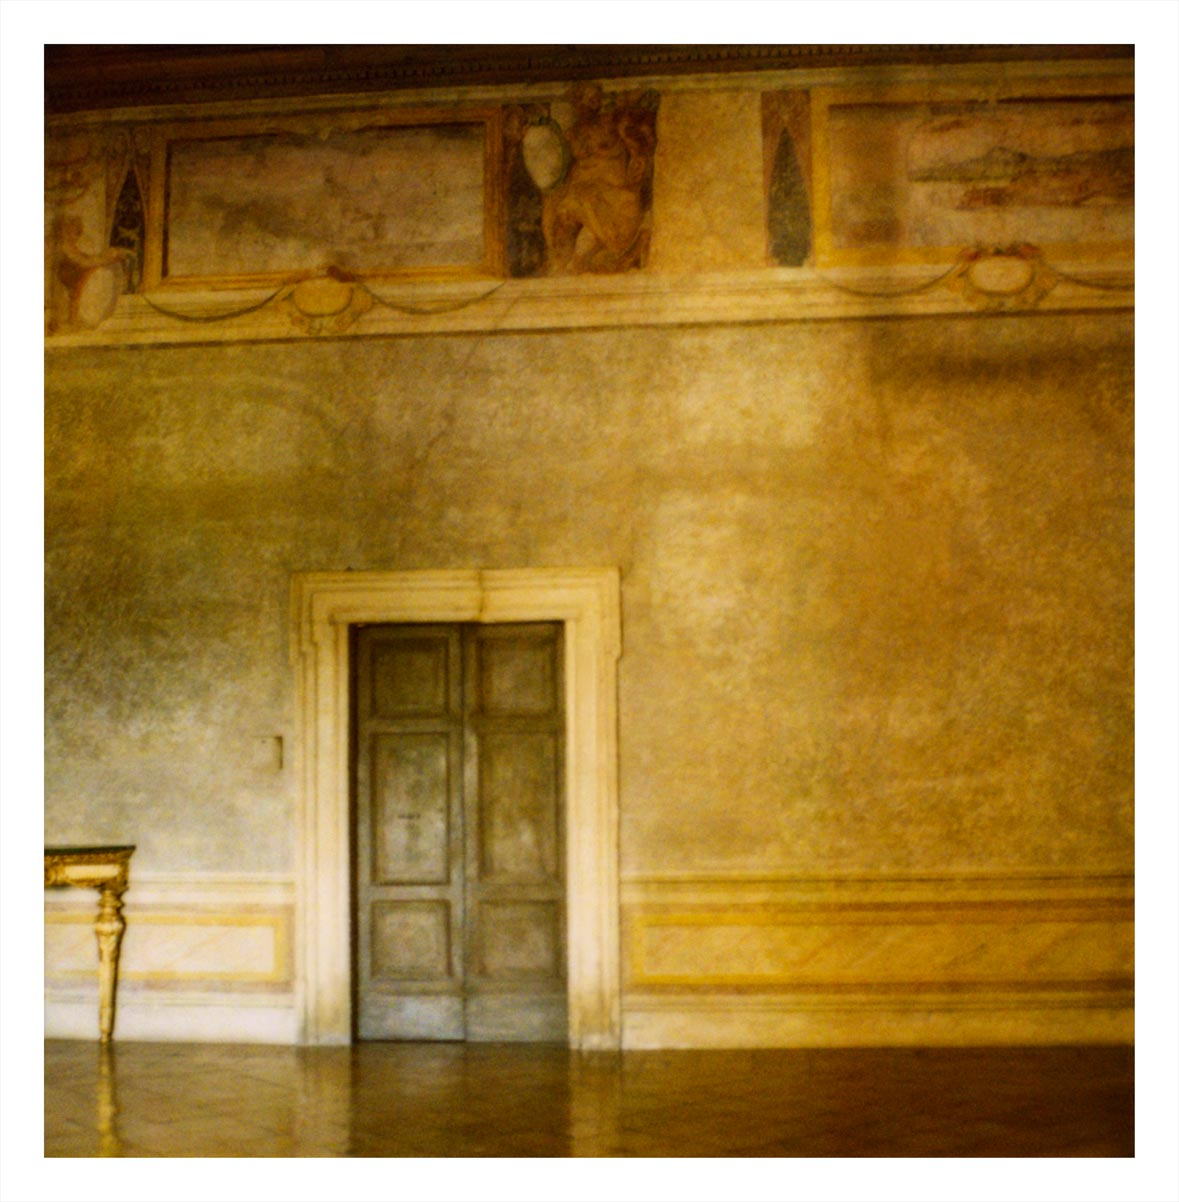 Grand-Tour-Cinecitta-Villa-Medicis-Rome-François-Halard-023